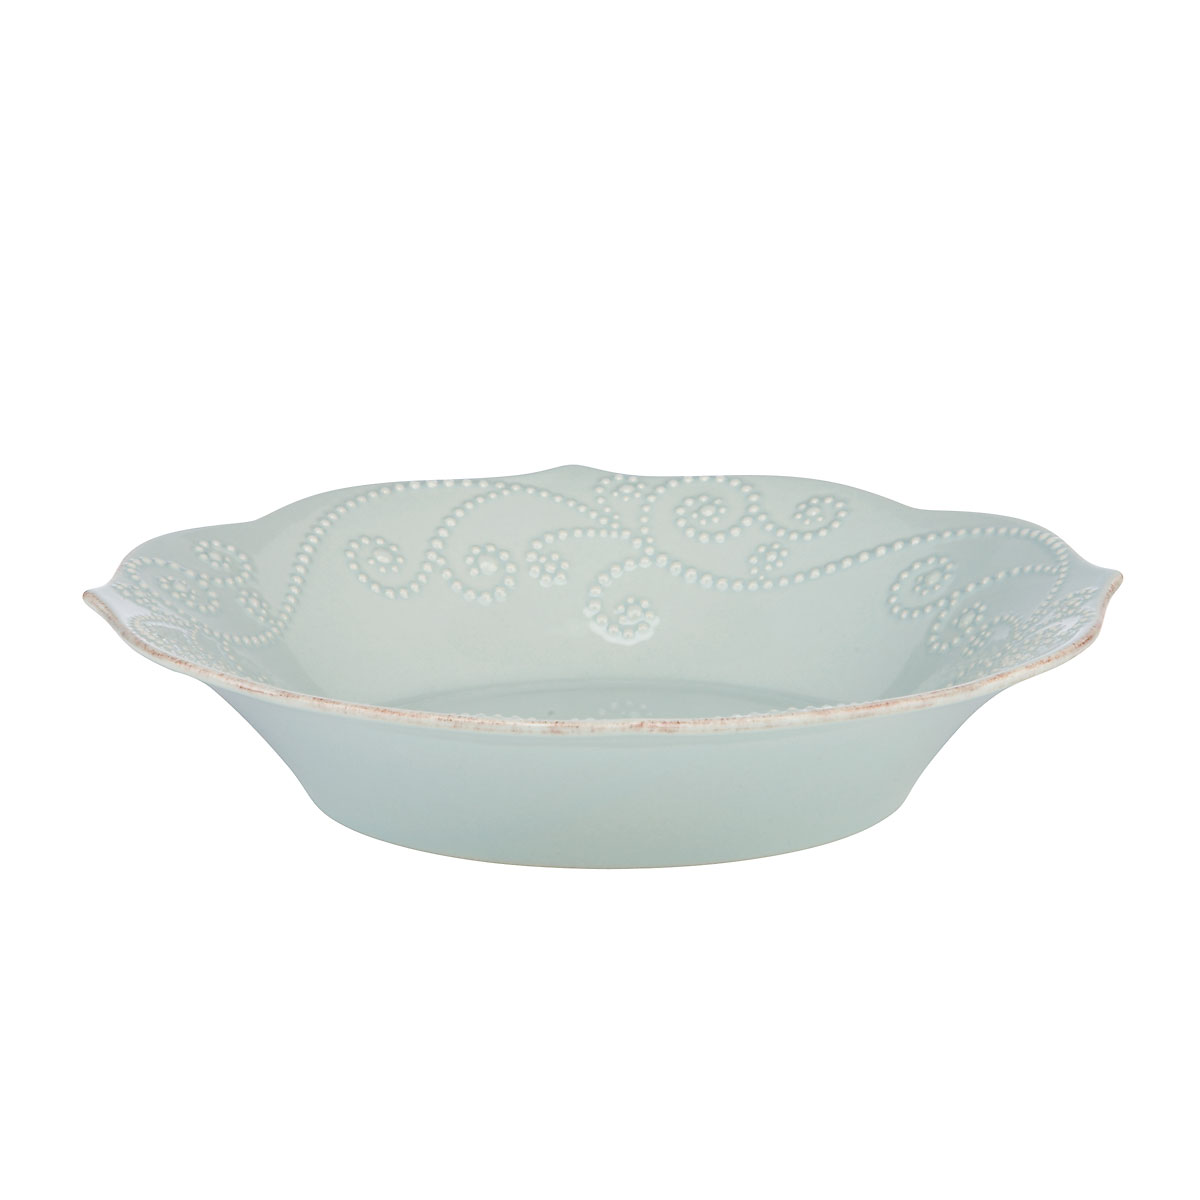 Lenox French Perle Blue Dinnerware Pasta Bowl